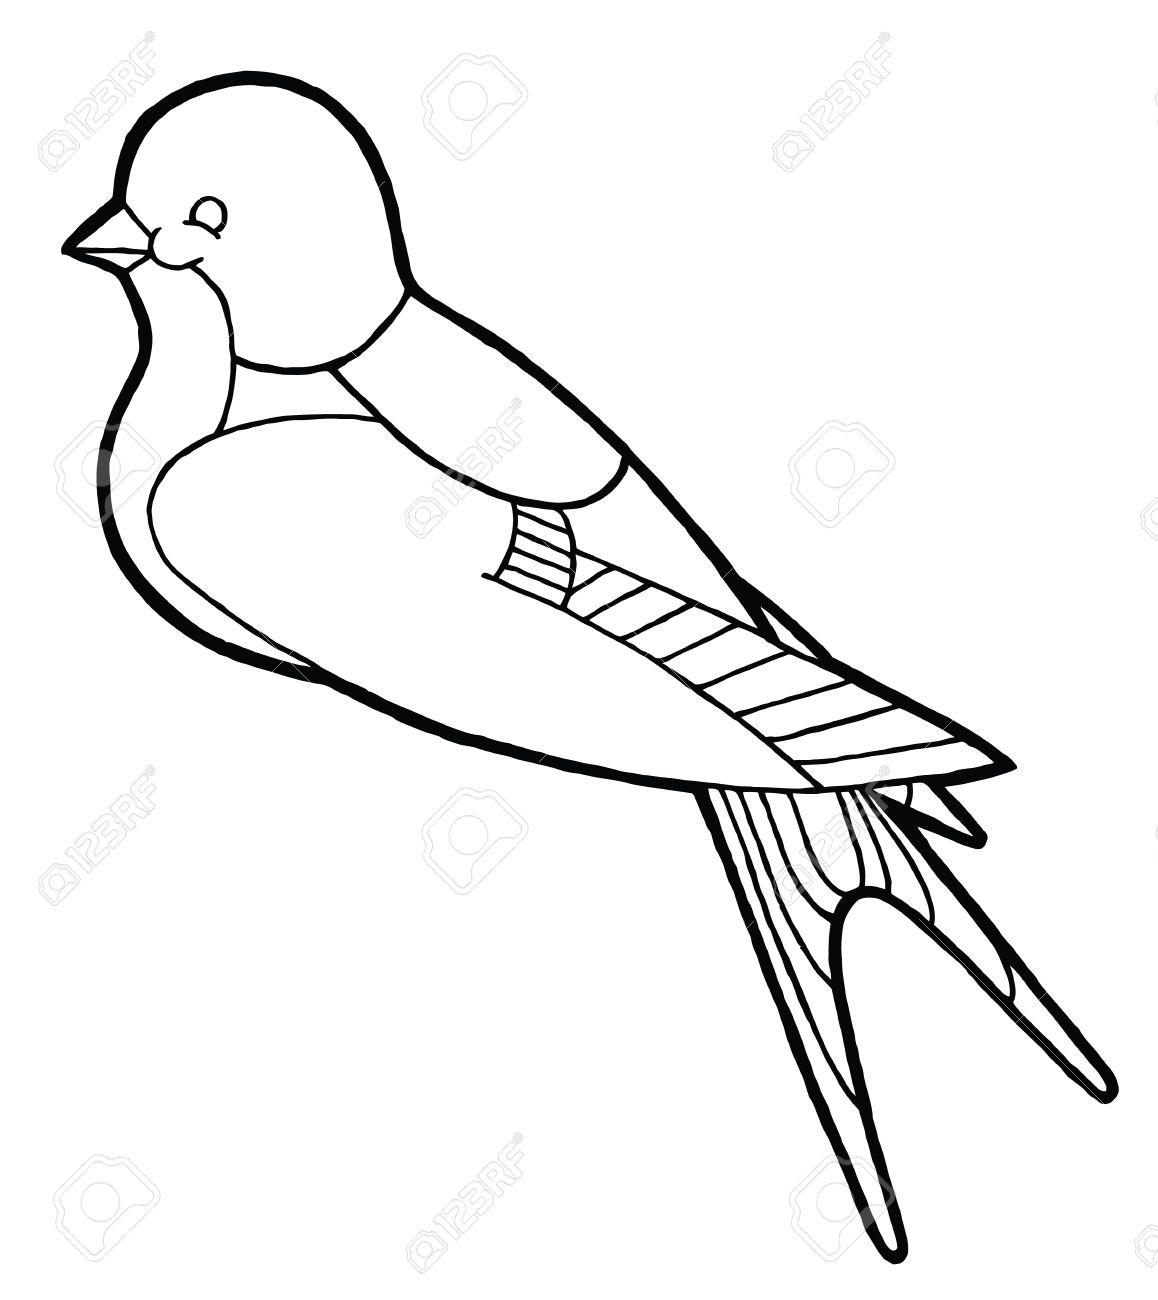 1158x1300 Contour Hand Drawing Contour Hand Drawing Swallow